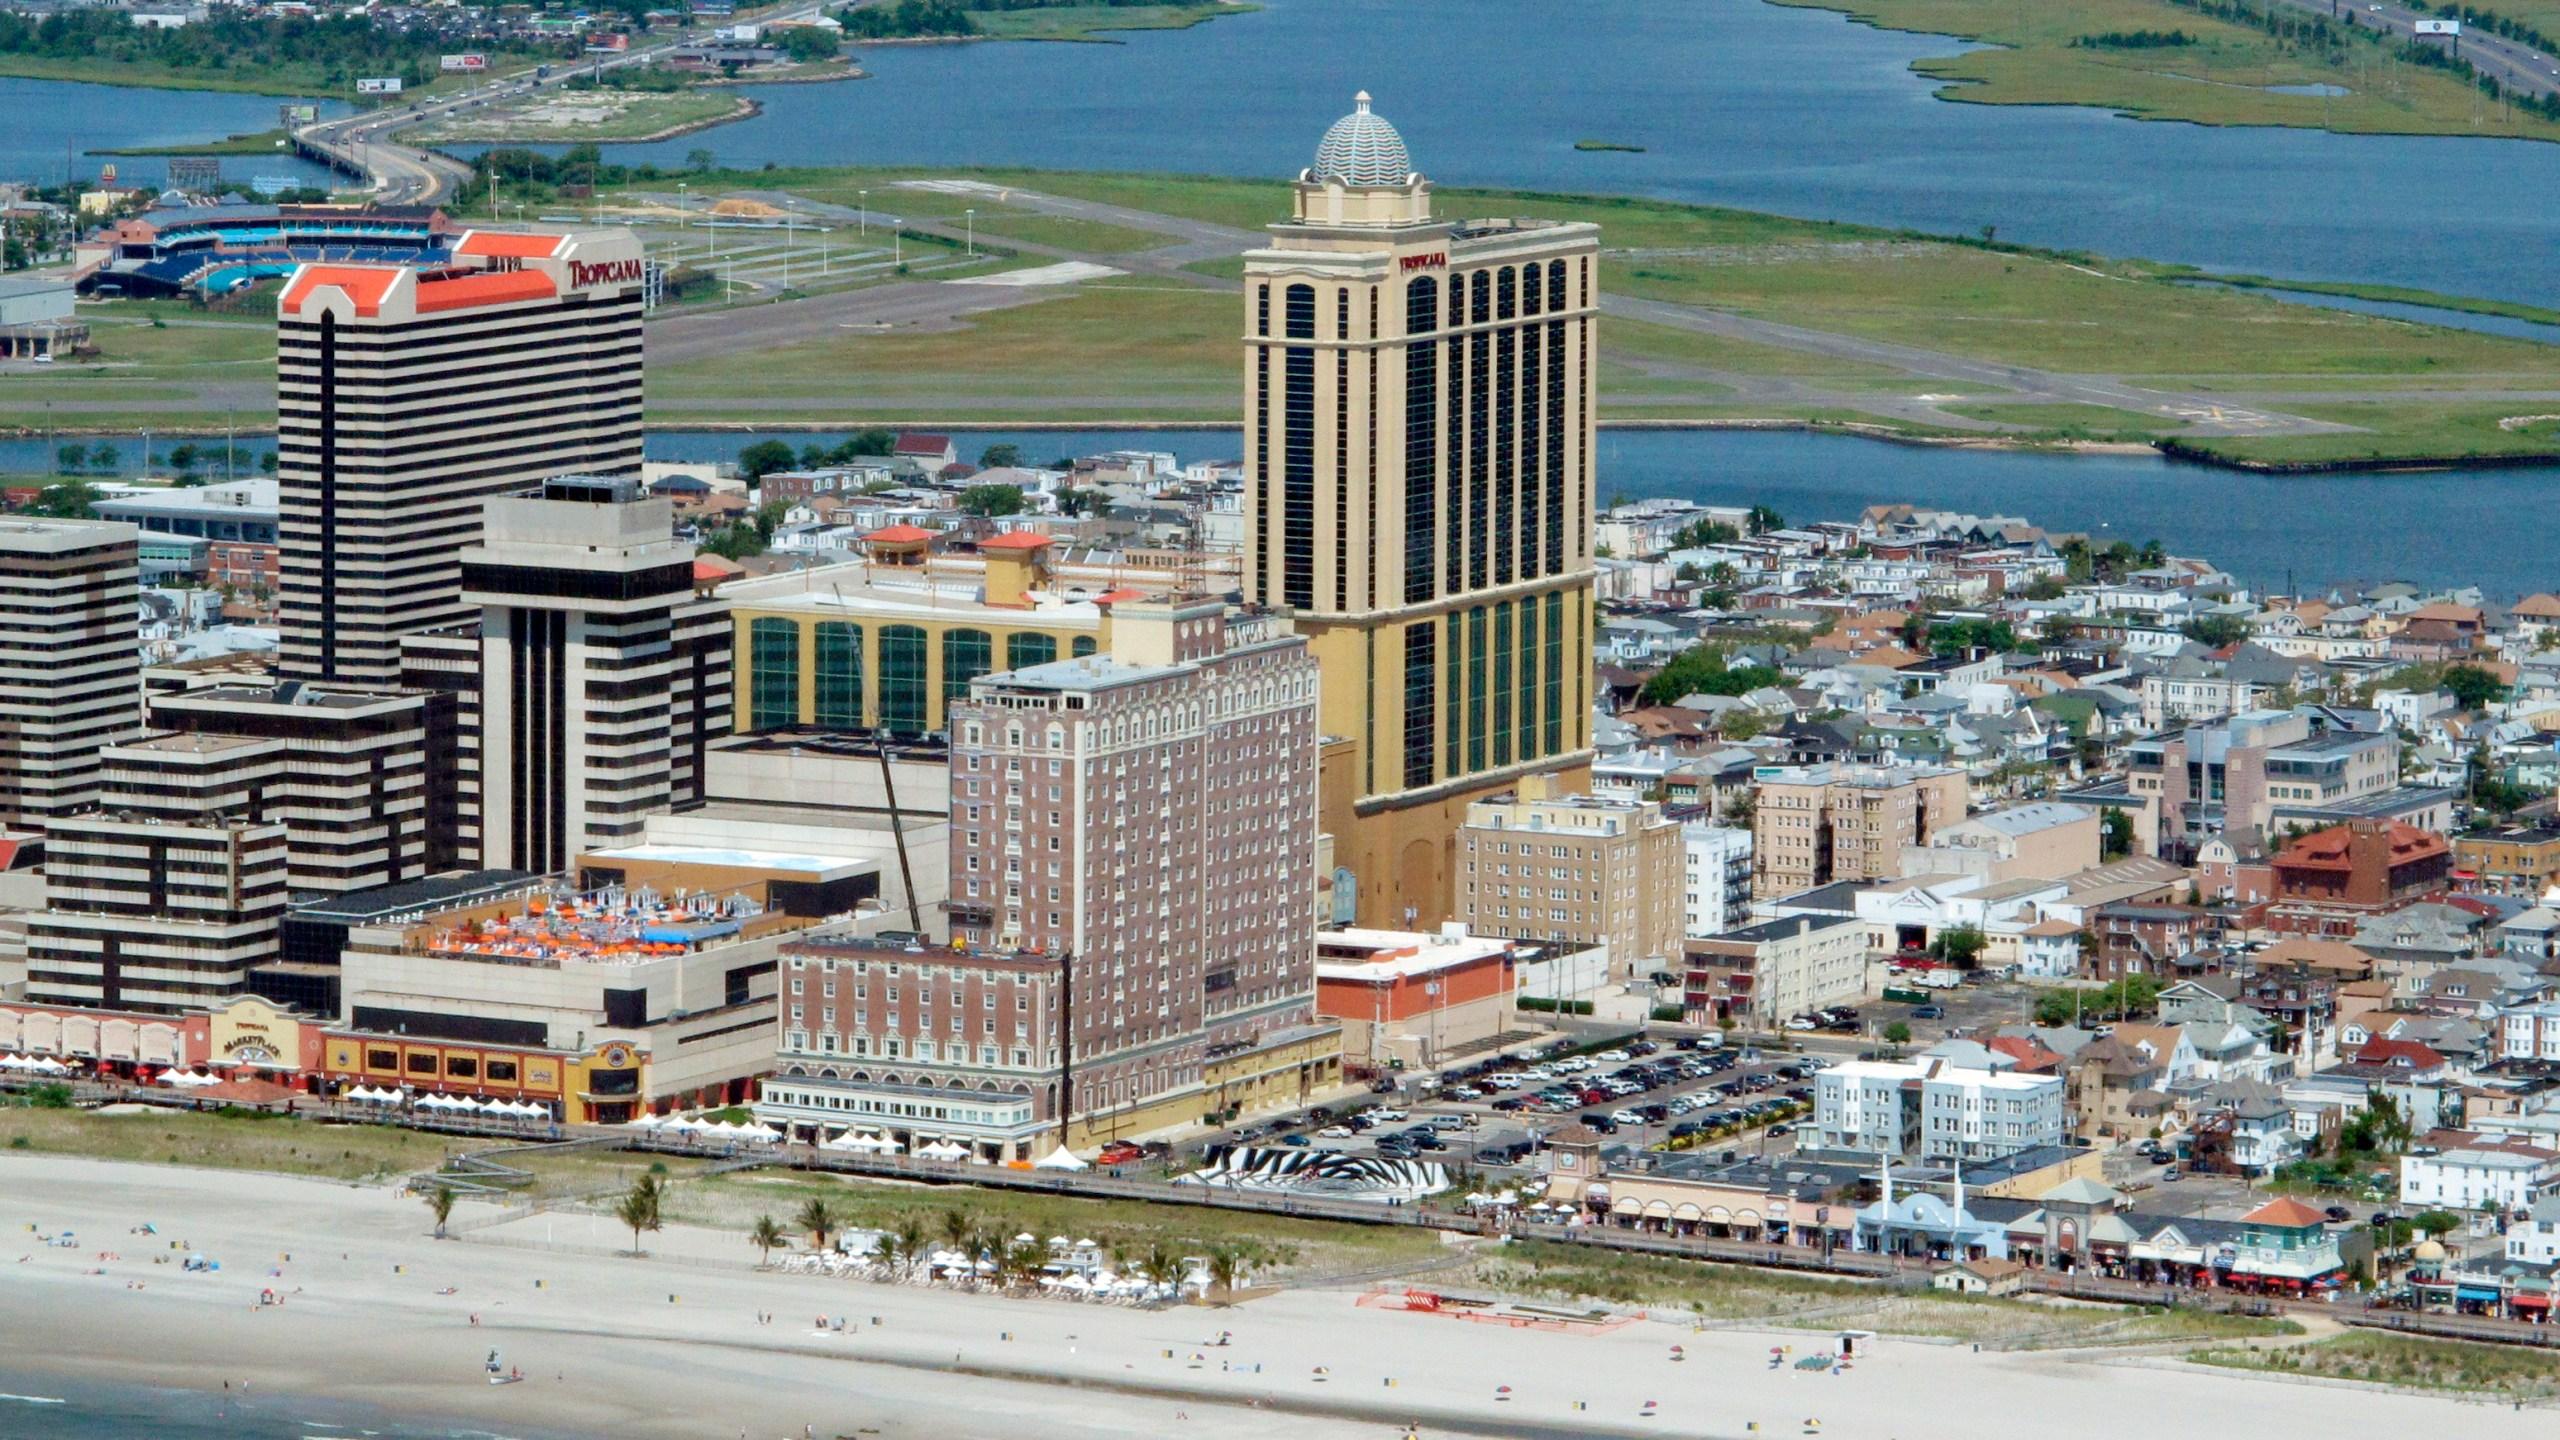 Christmas Show At Tropicana Hotel Atlantic City Nj 2020 New Tropicana boss makes 4 of 9 Atlantic City casinos run by women